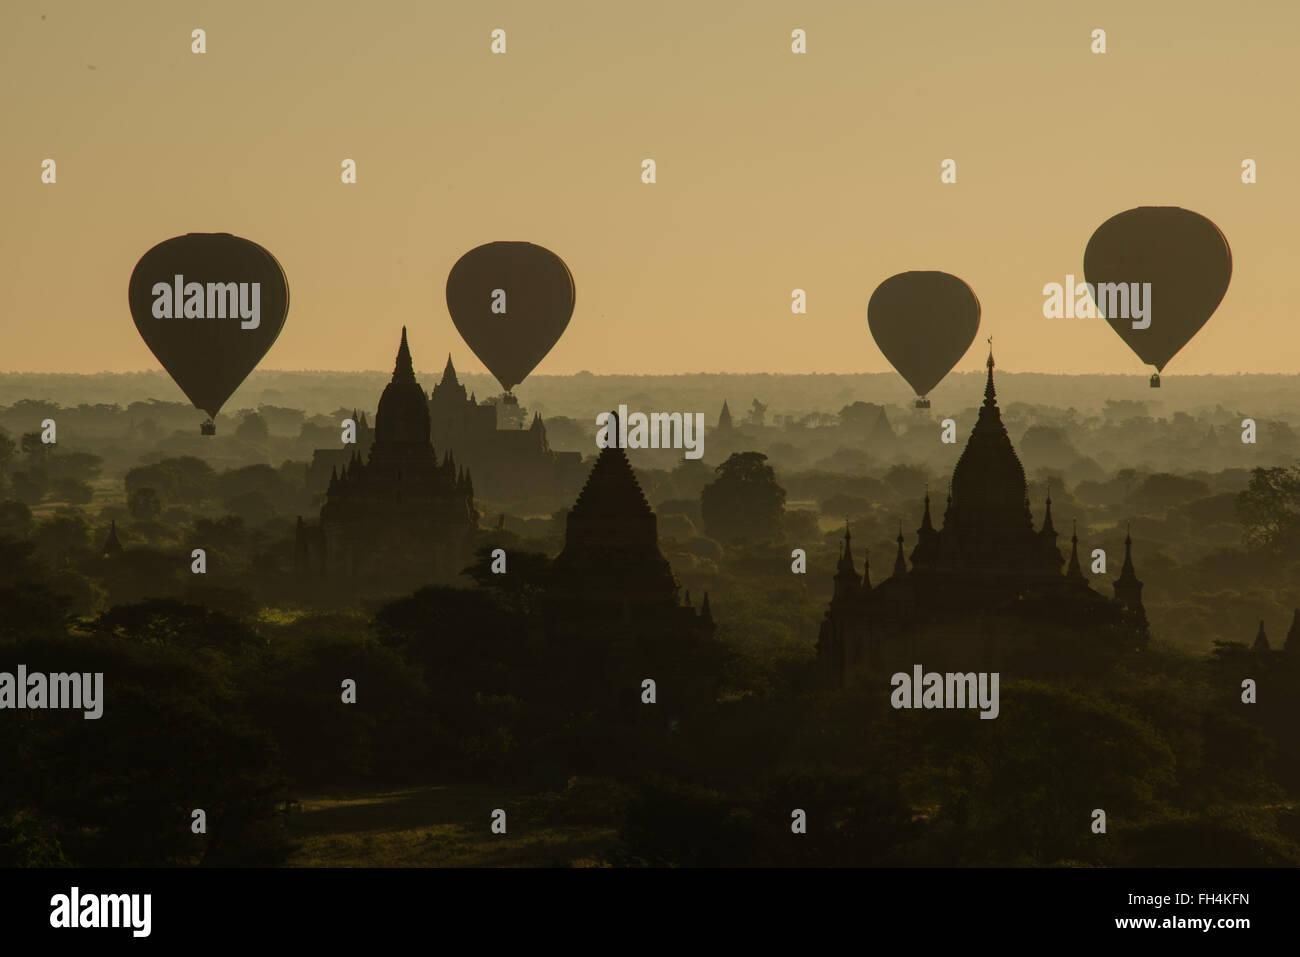 Balloons over Bagan - Stock Image